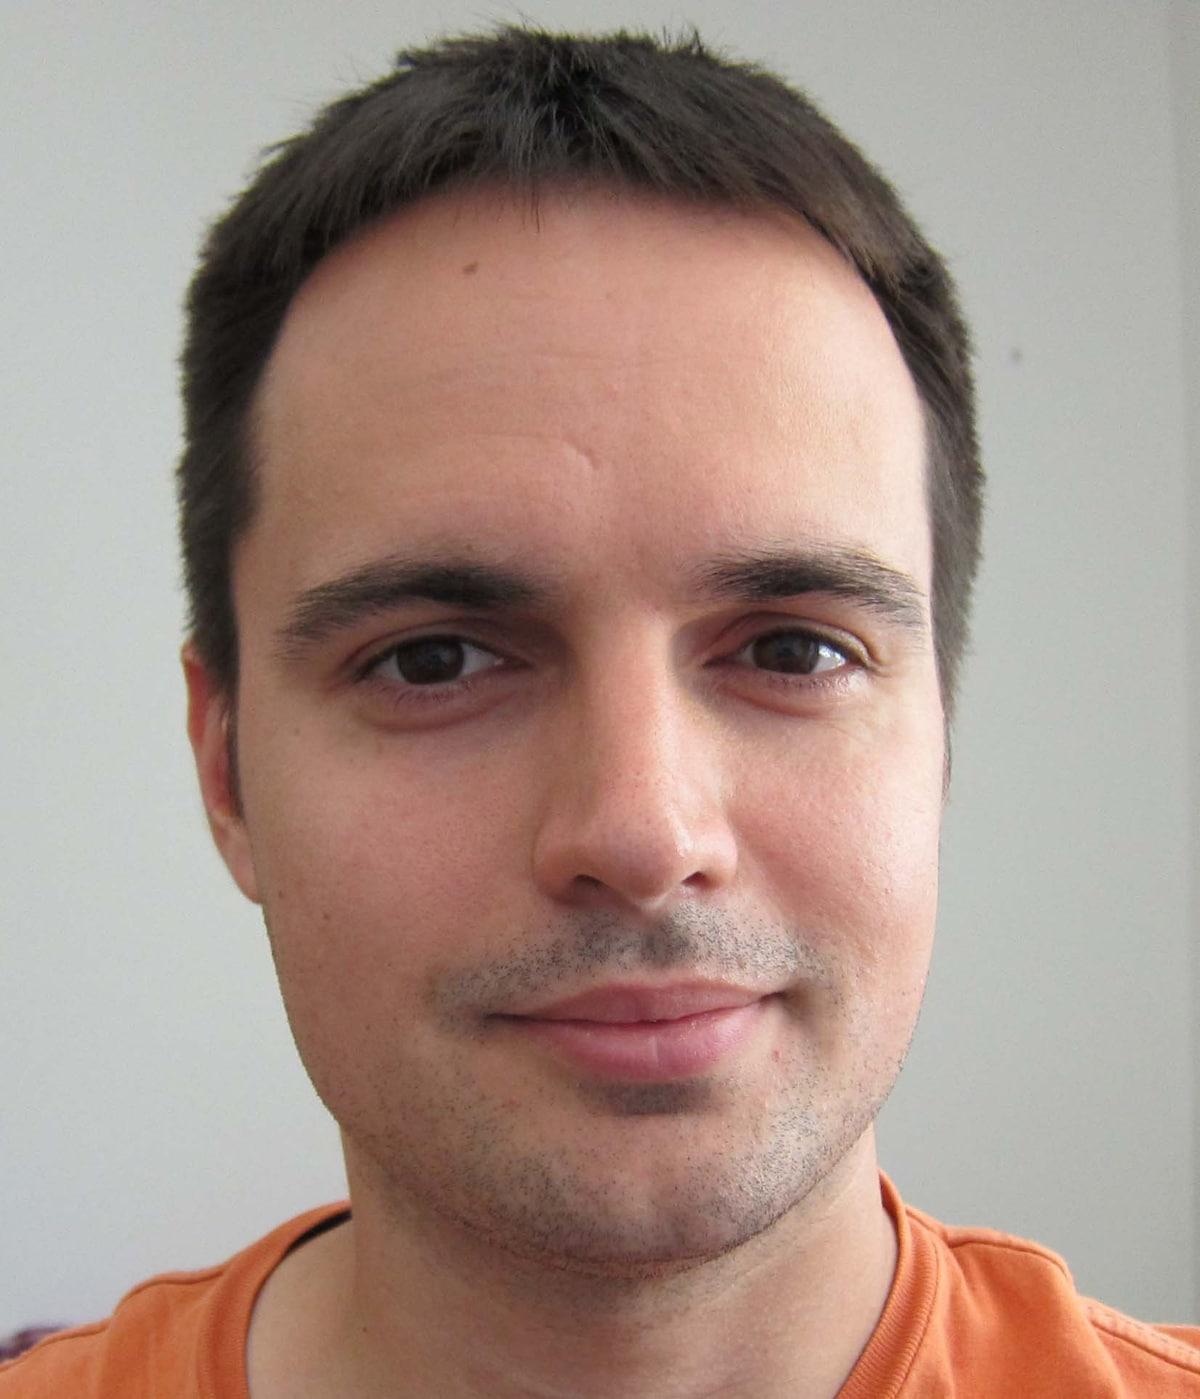 Vladimir From Petrovac, Montenegro